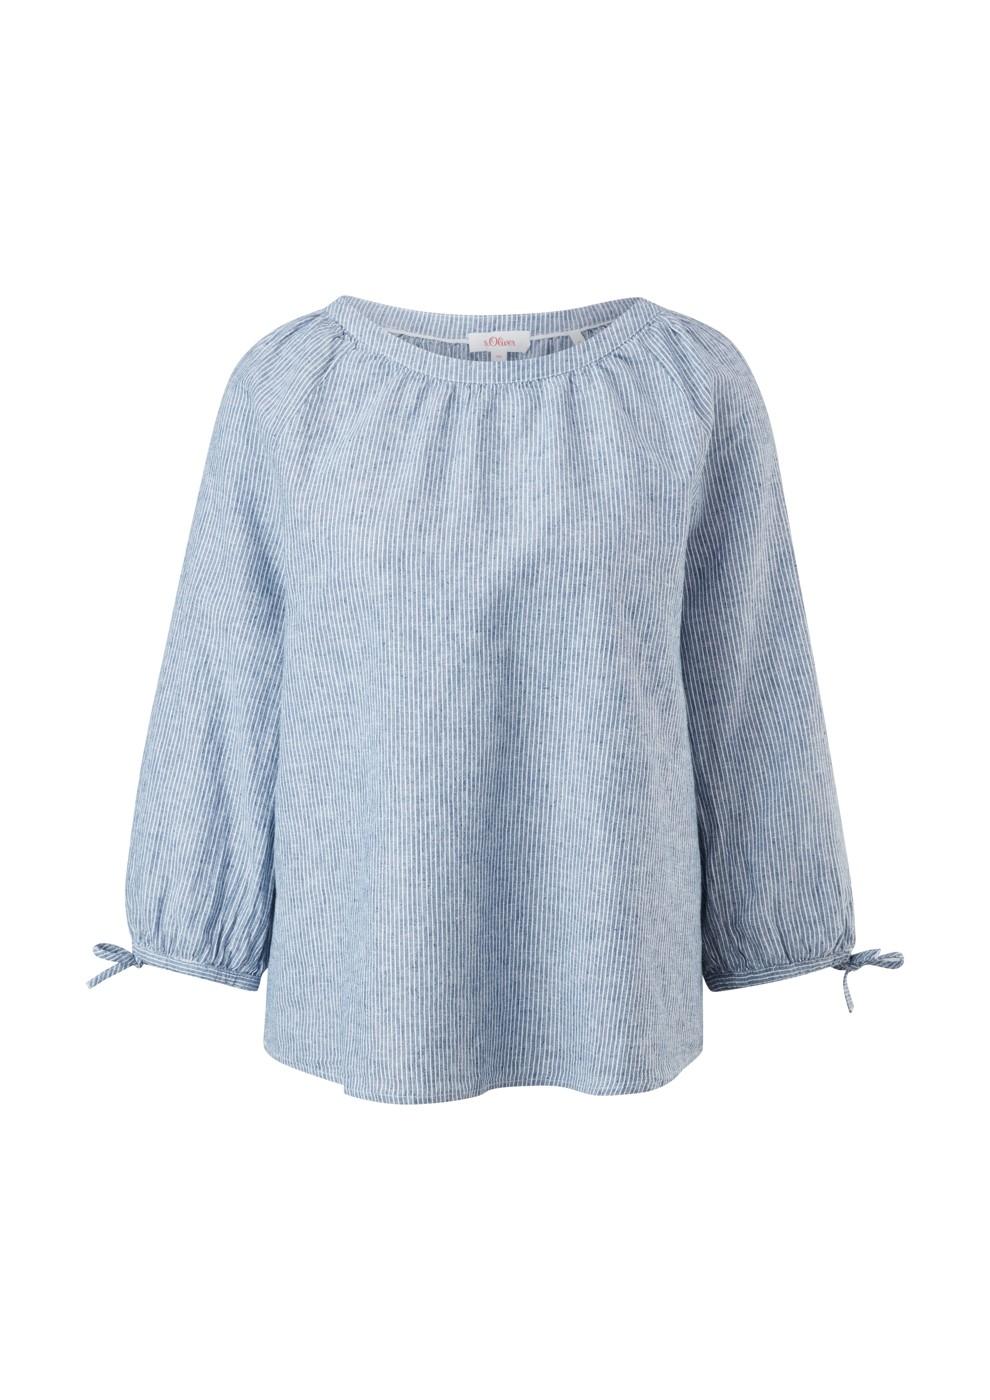 120 Bluse 3/4 Arm - Damen